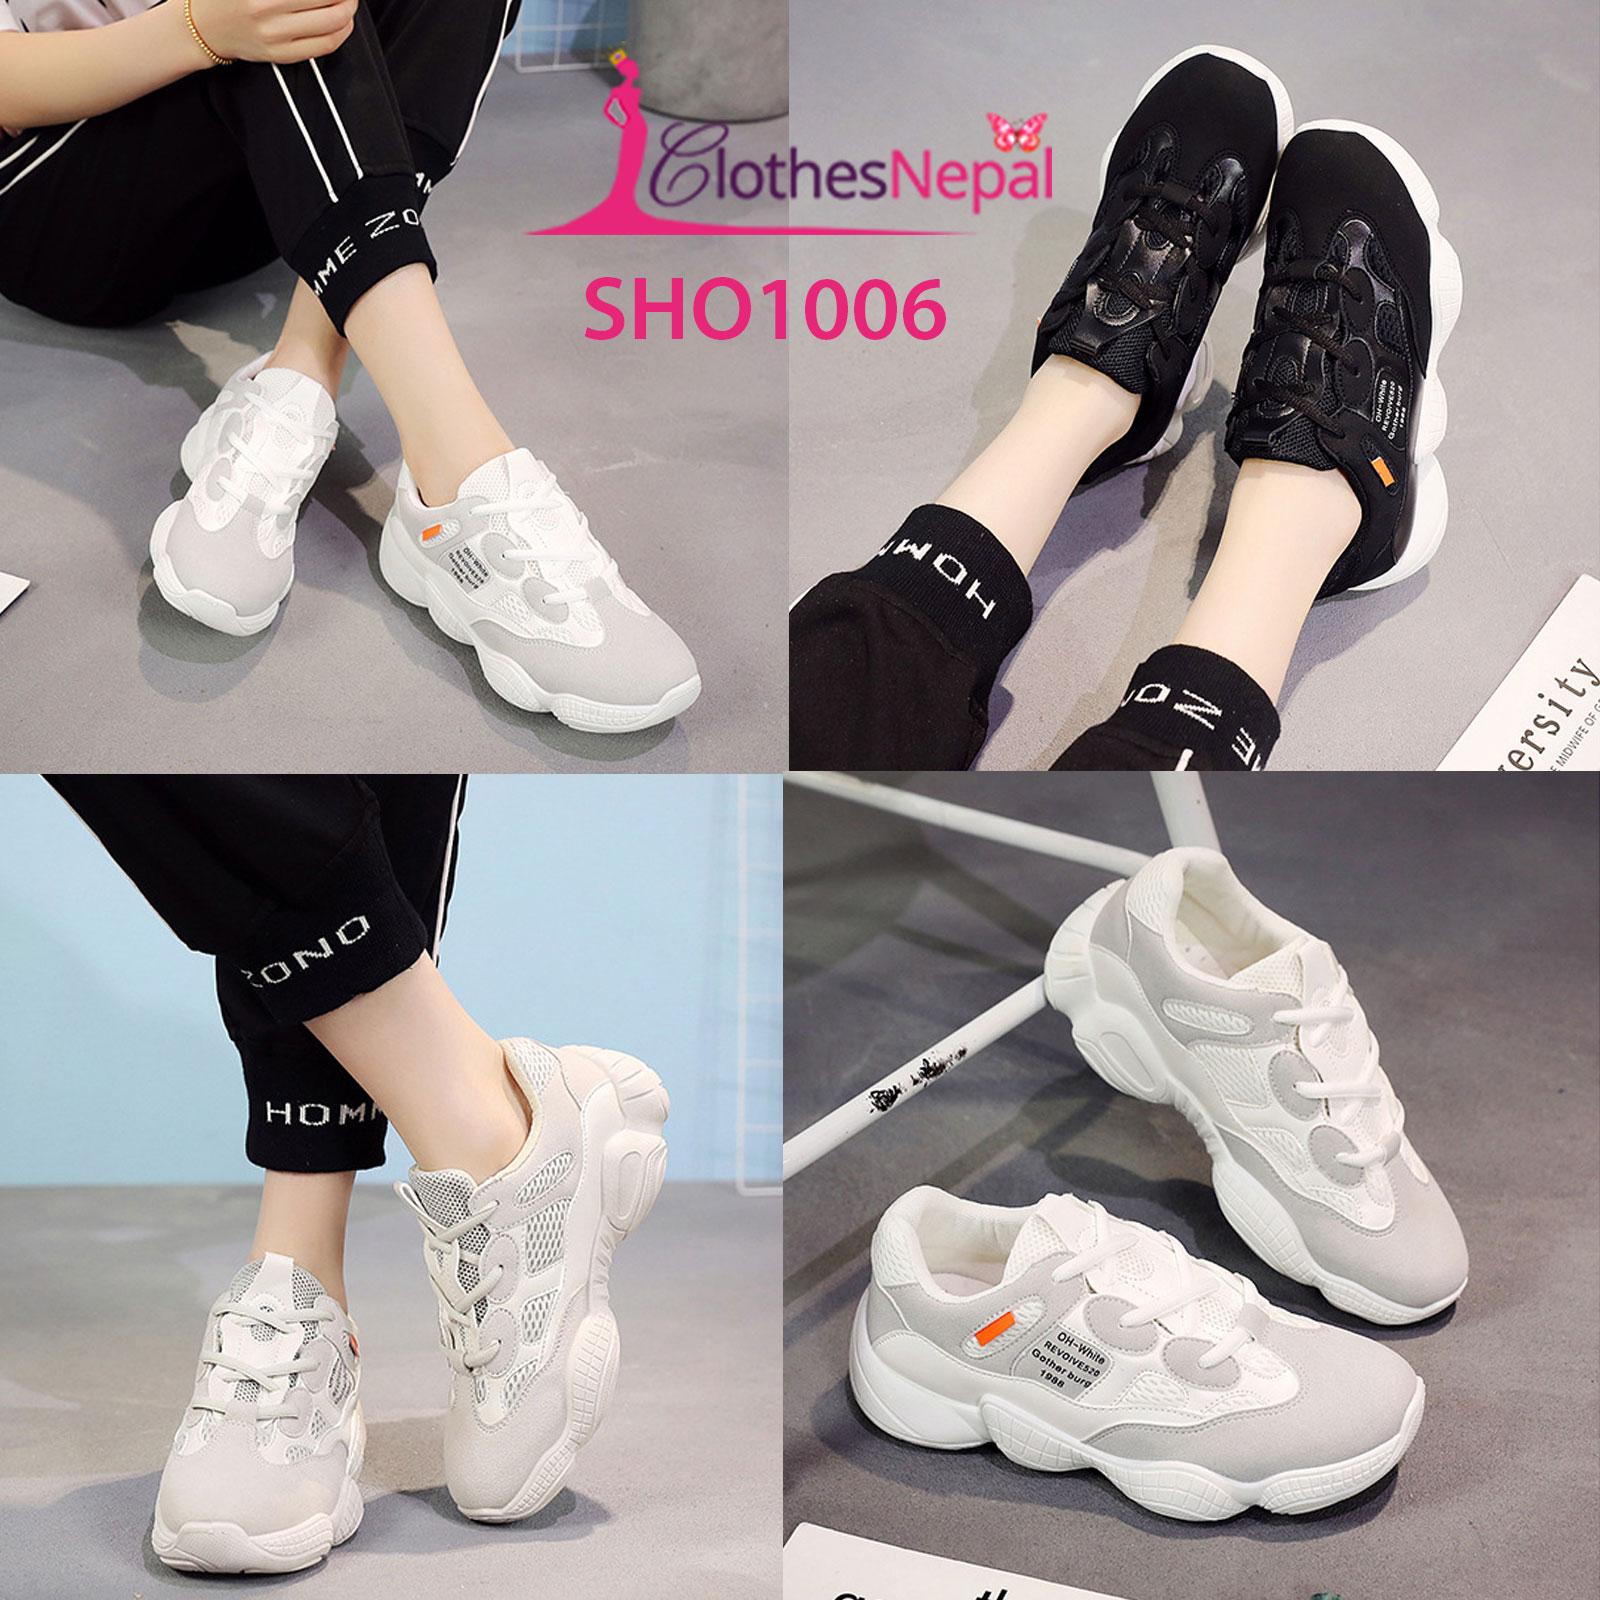 SHO1006